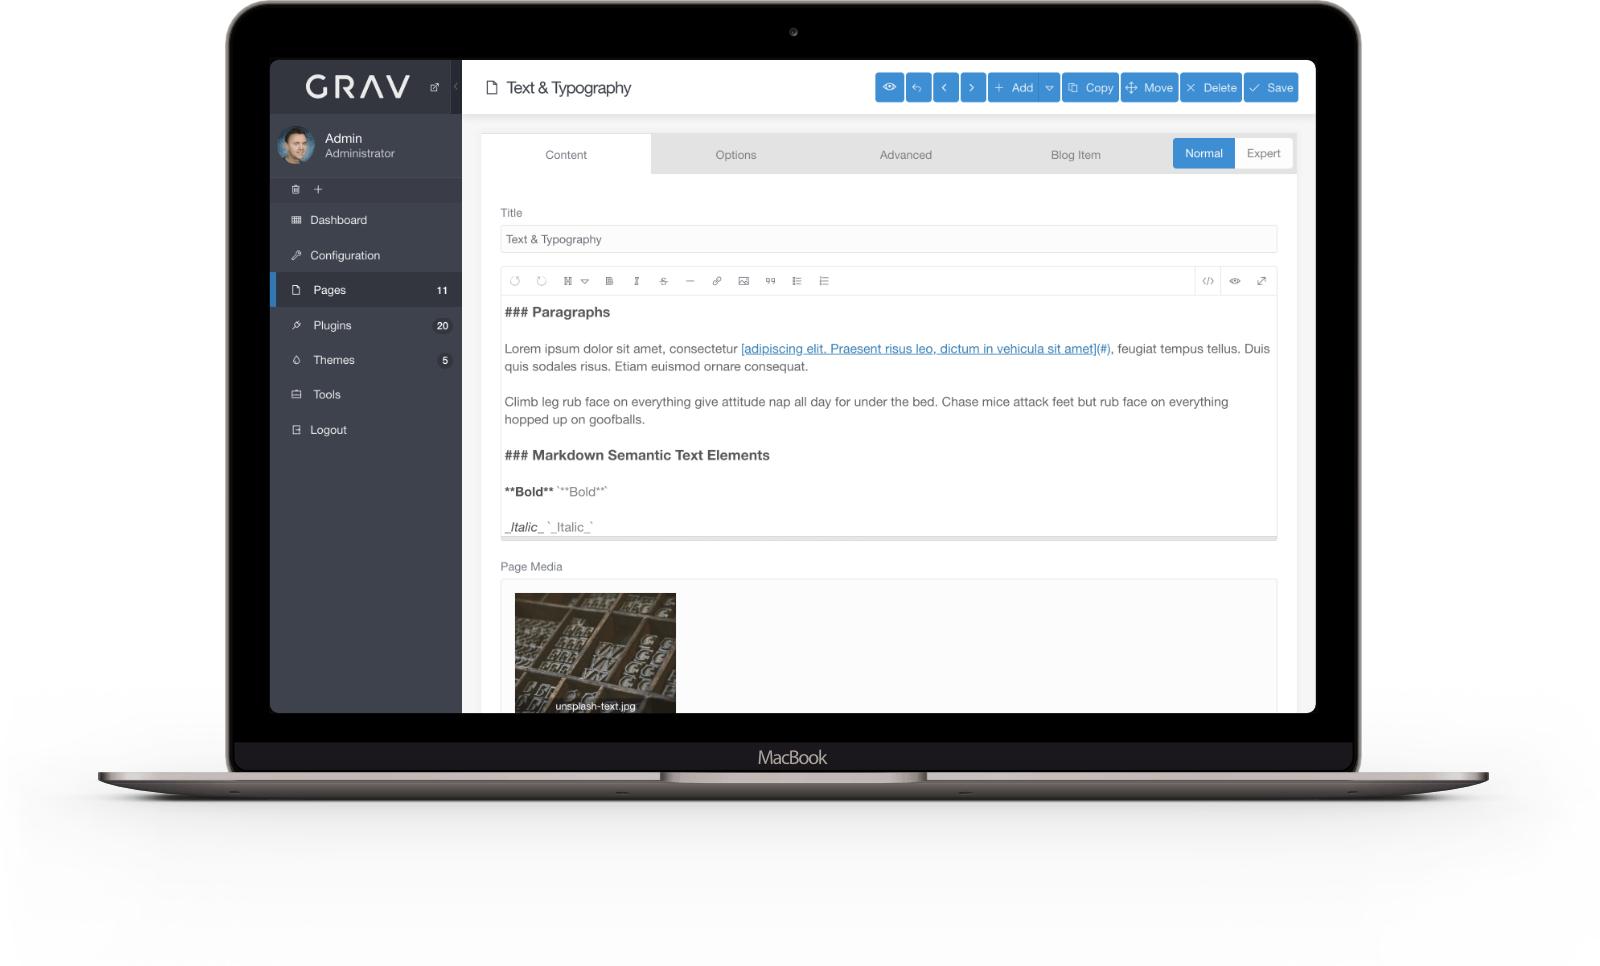 Grav Screenshot 3